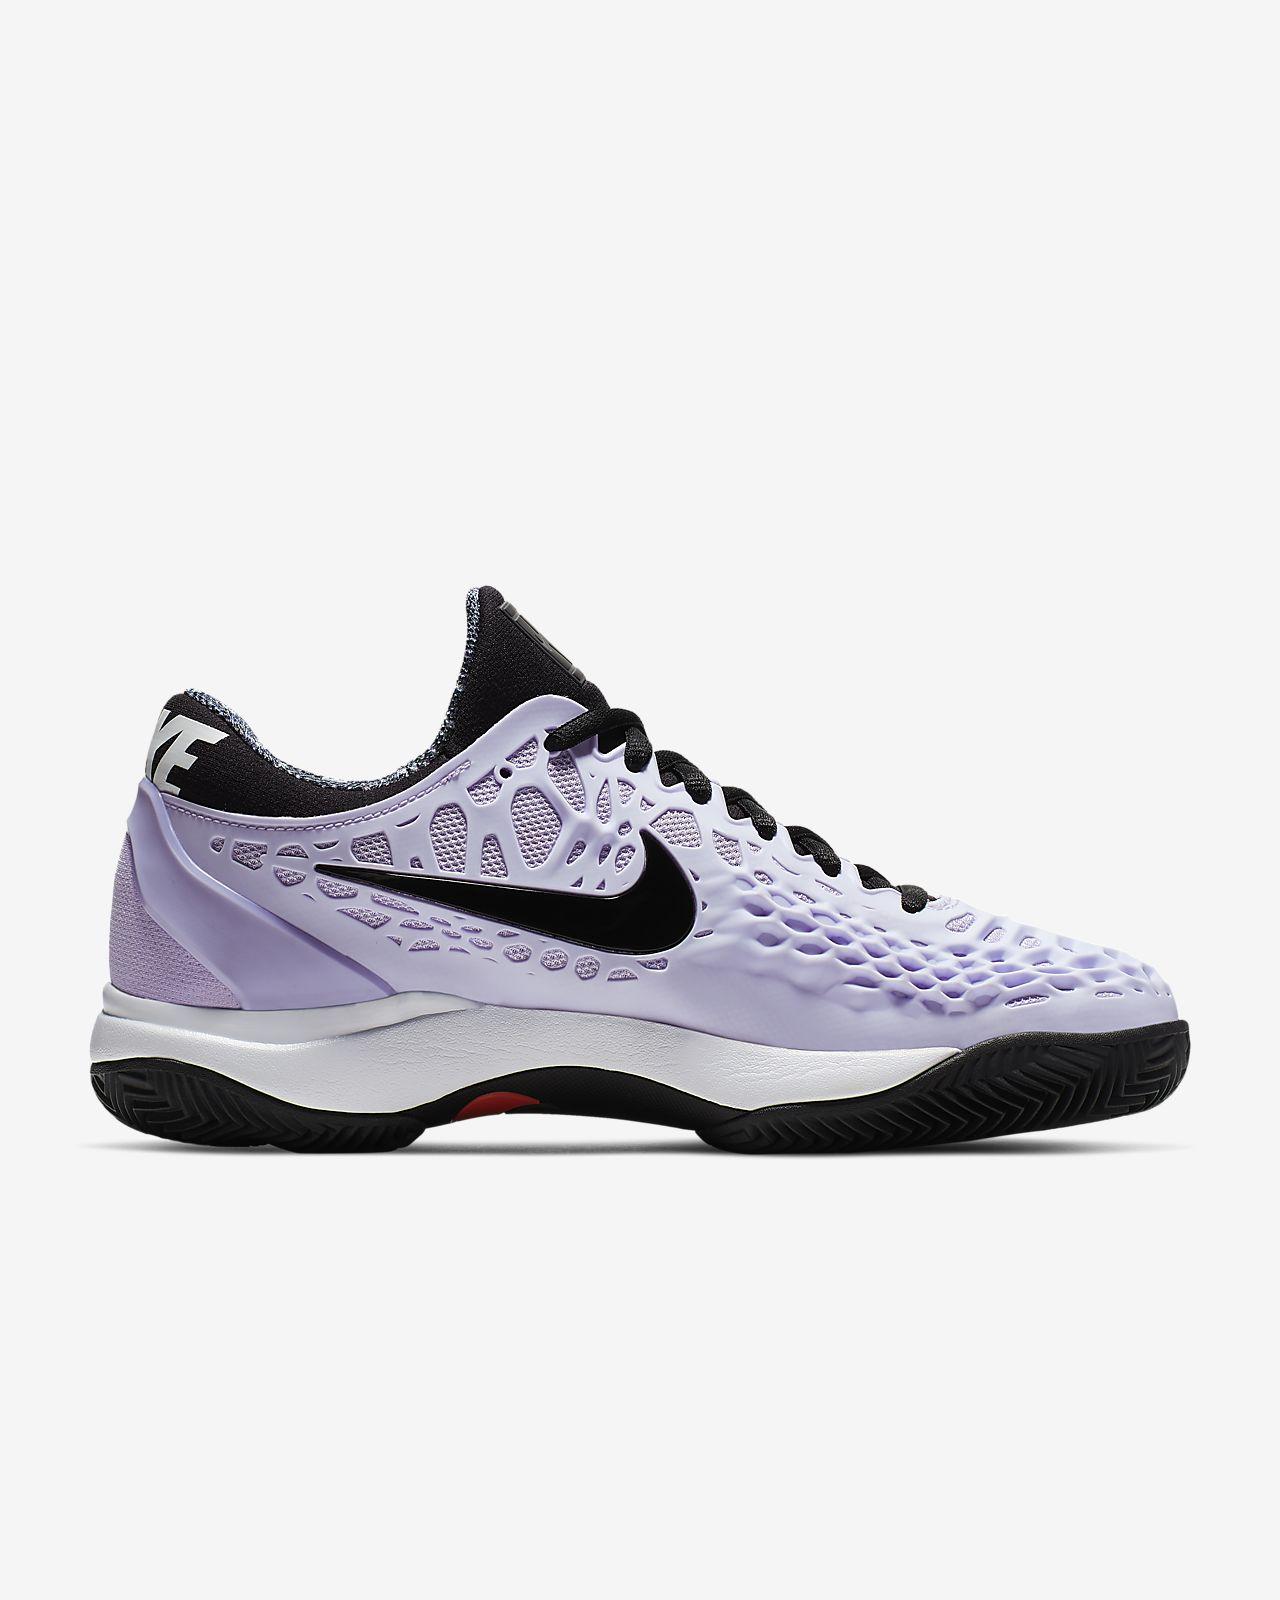 Nike Air Cage Court Donna Scarpe Dimensione:Euro 36 40